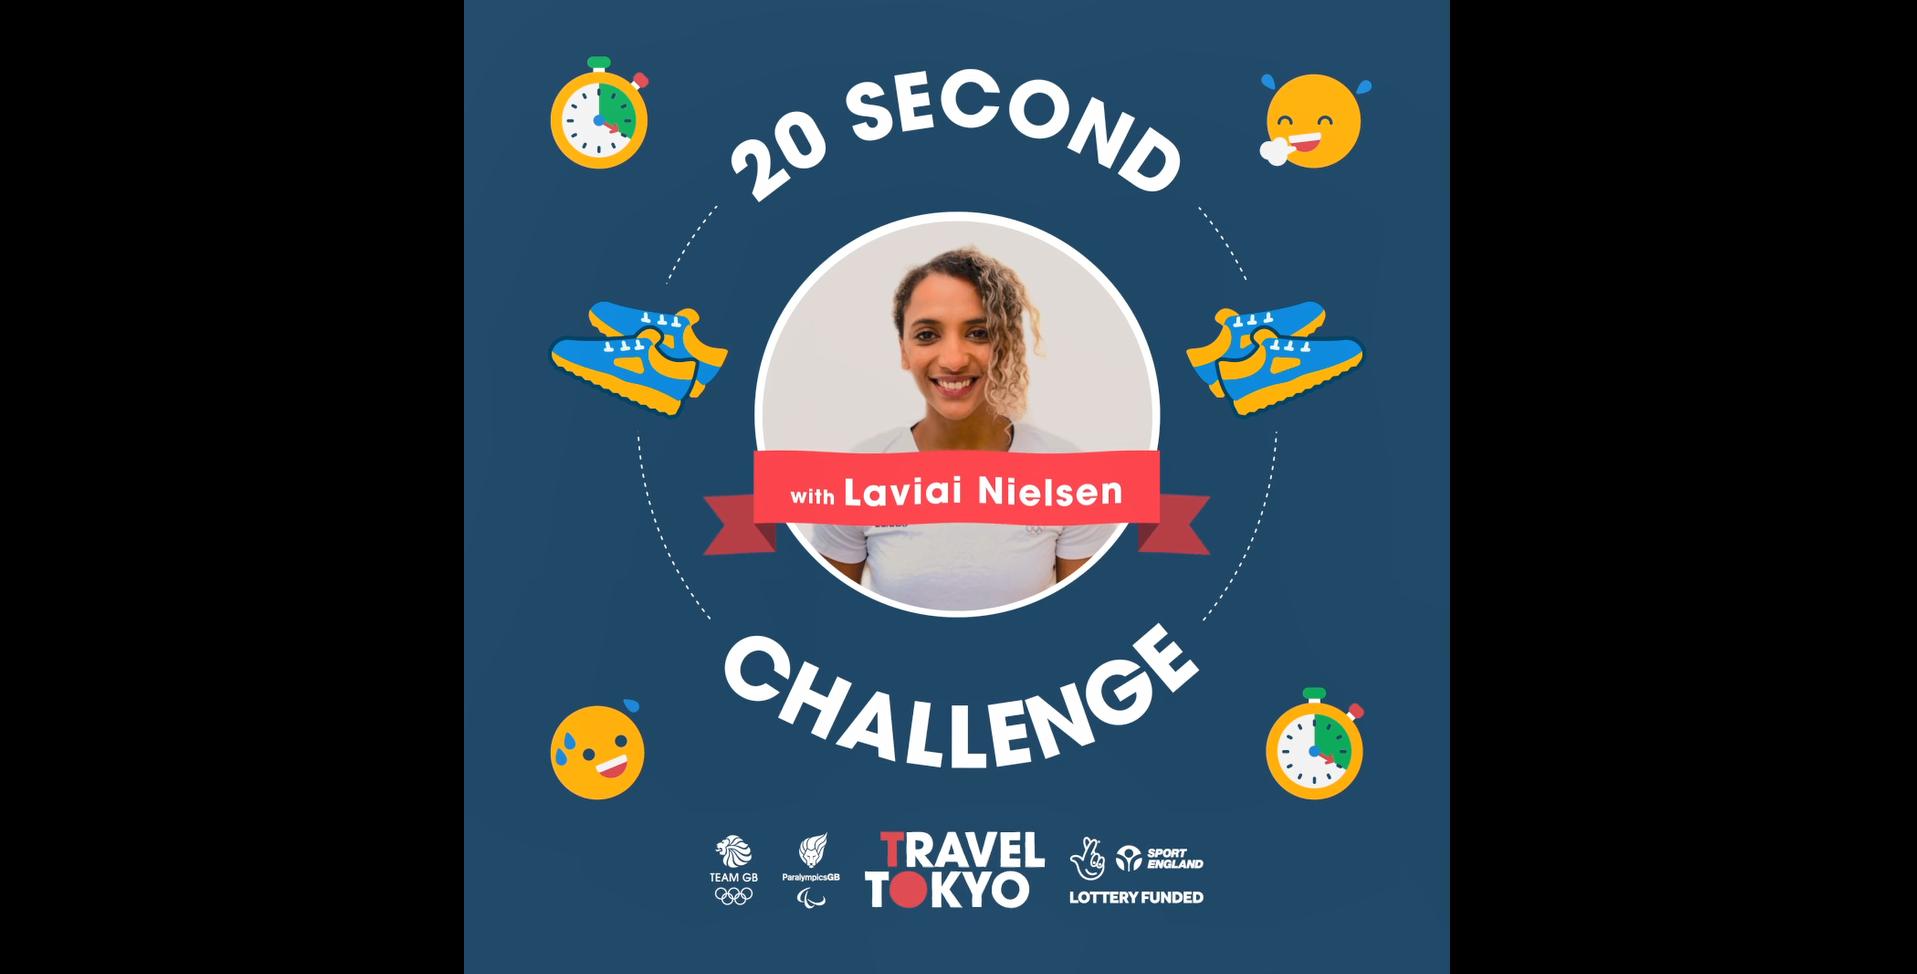 Laviai Nielsen's challenge